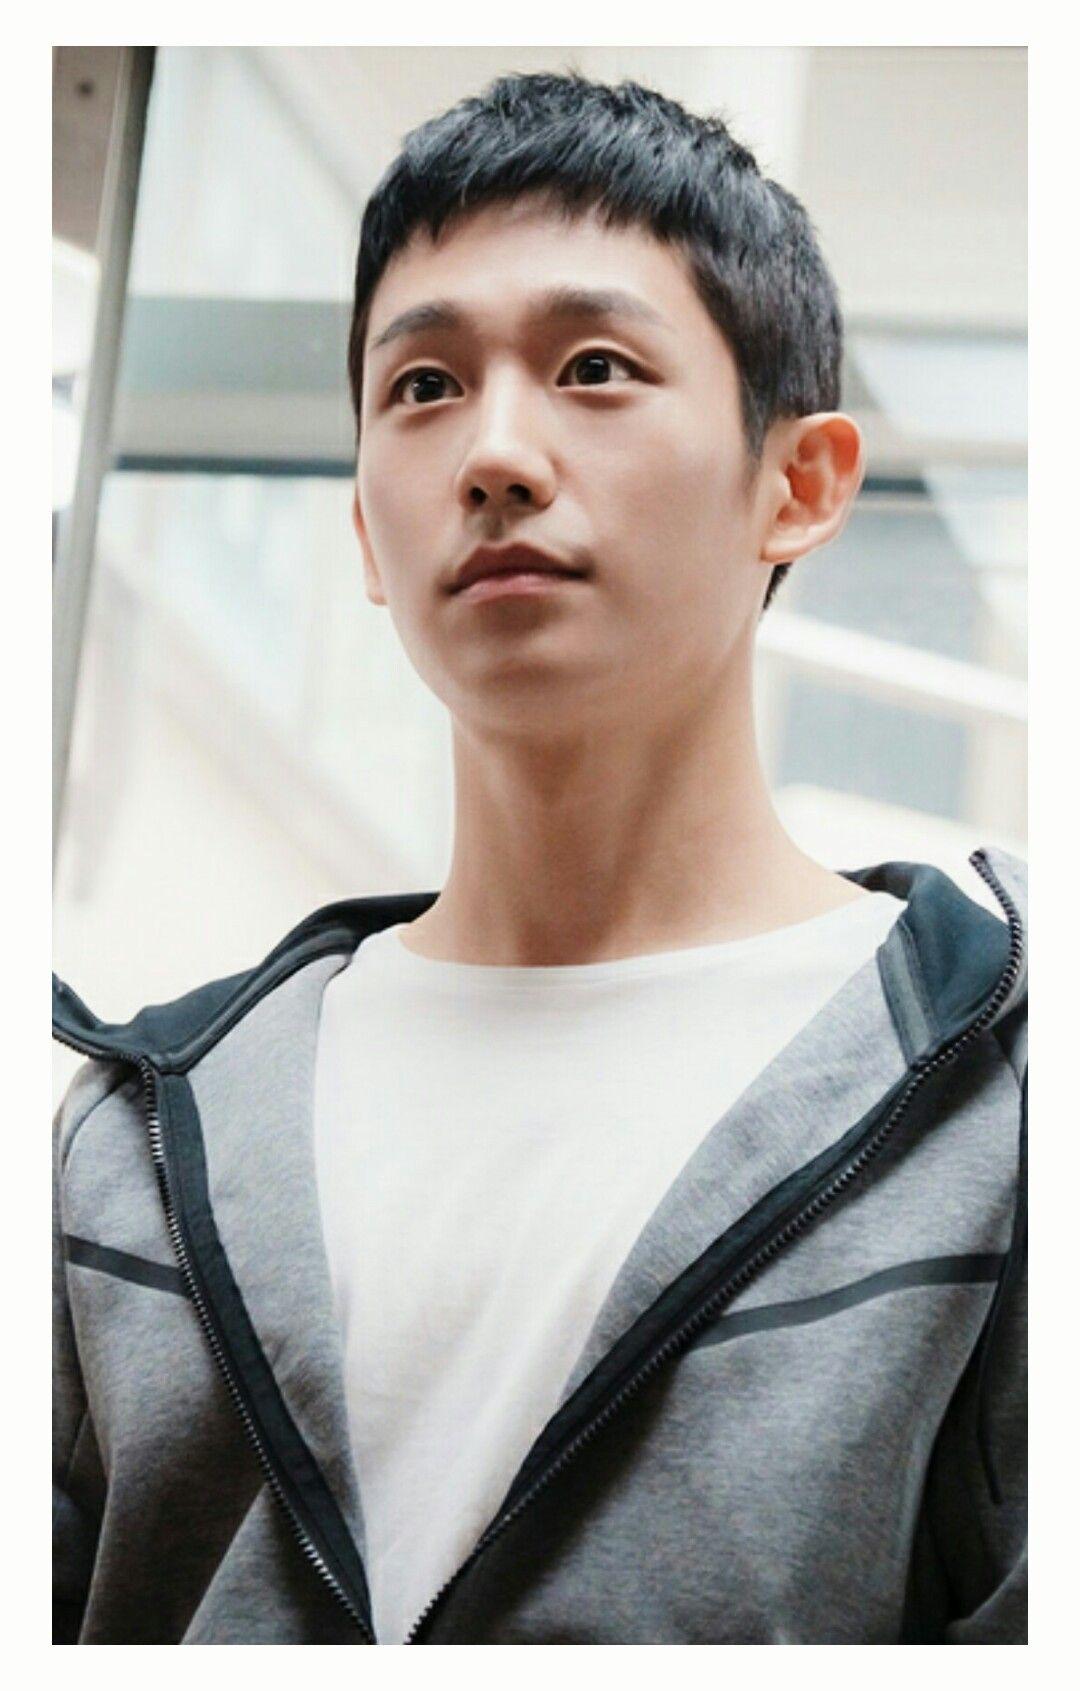 Jung Hae In | 짧은 머리 스타일 남자, 남자 머리, 남자 짧은 머리